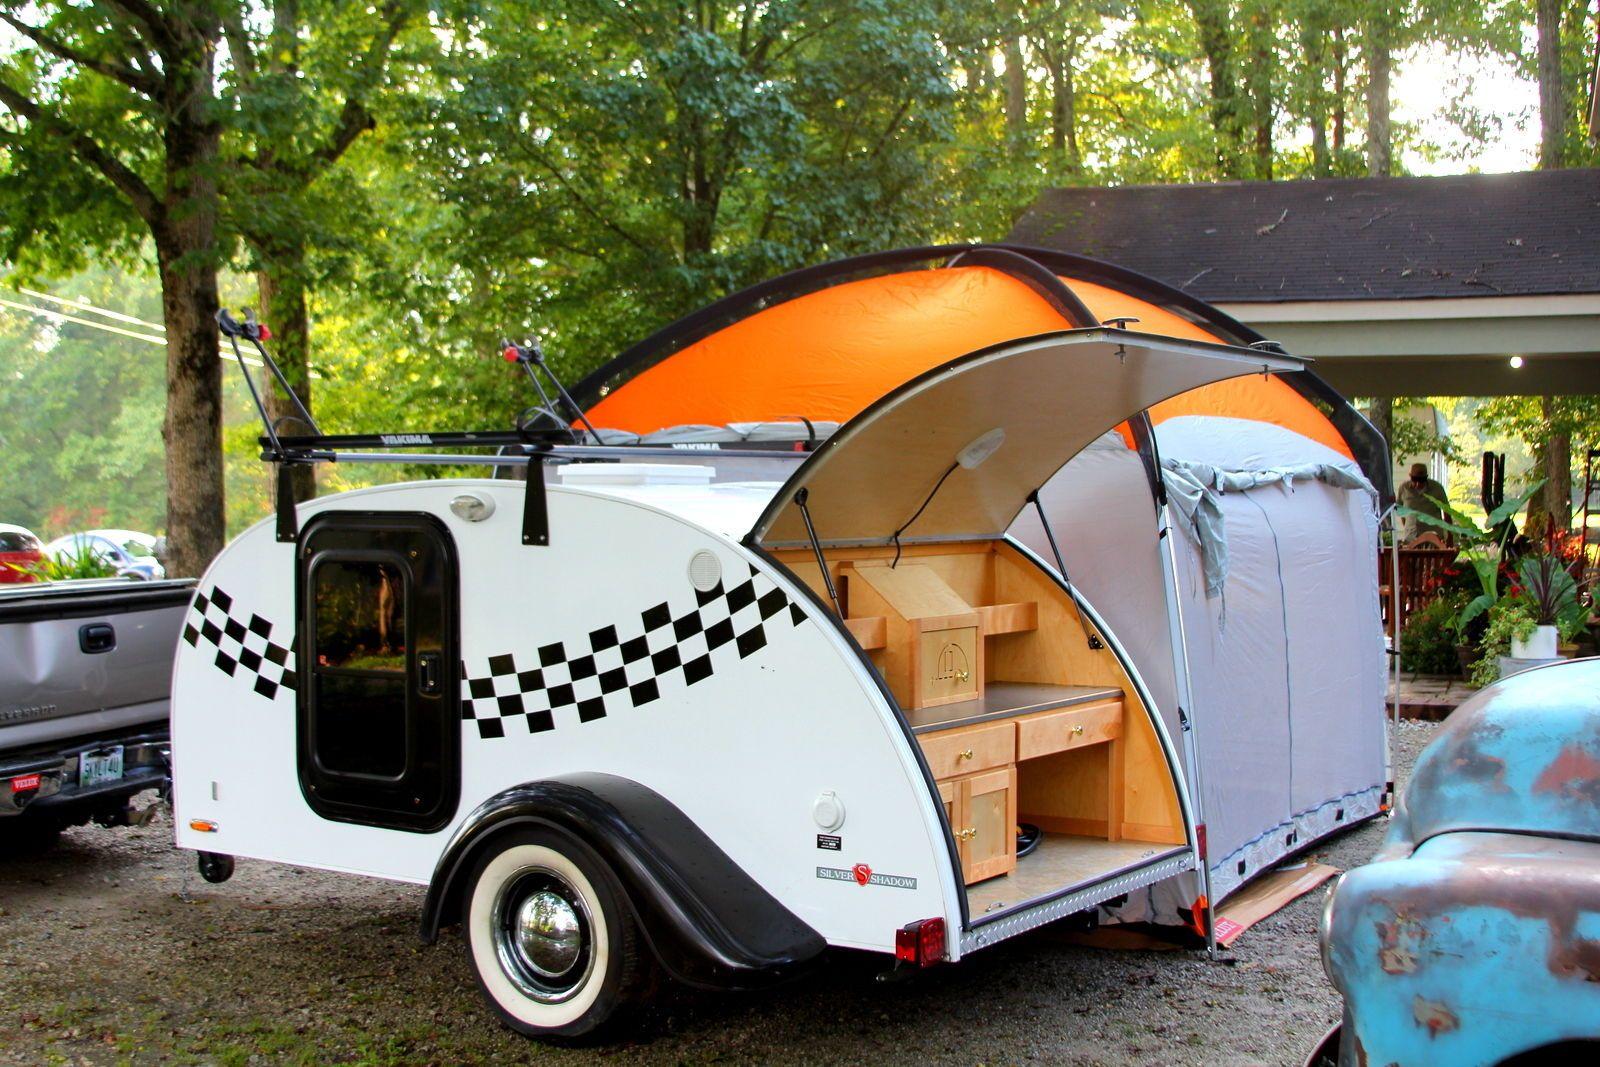 Custom Teardrop C&er Trailer With Roof u0026 Bike Racks and 10x10 attachable Tent & Custom Teardrop Camper Trailer With Roof u0026 Bike Racks and 10x10 ...